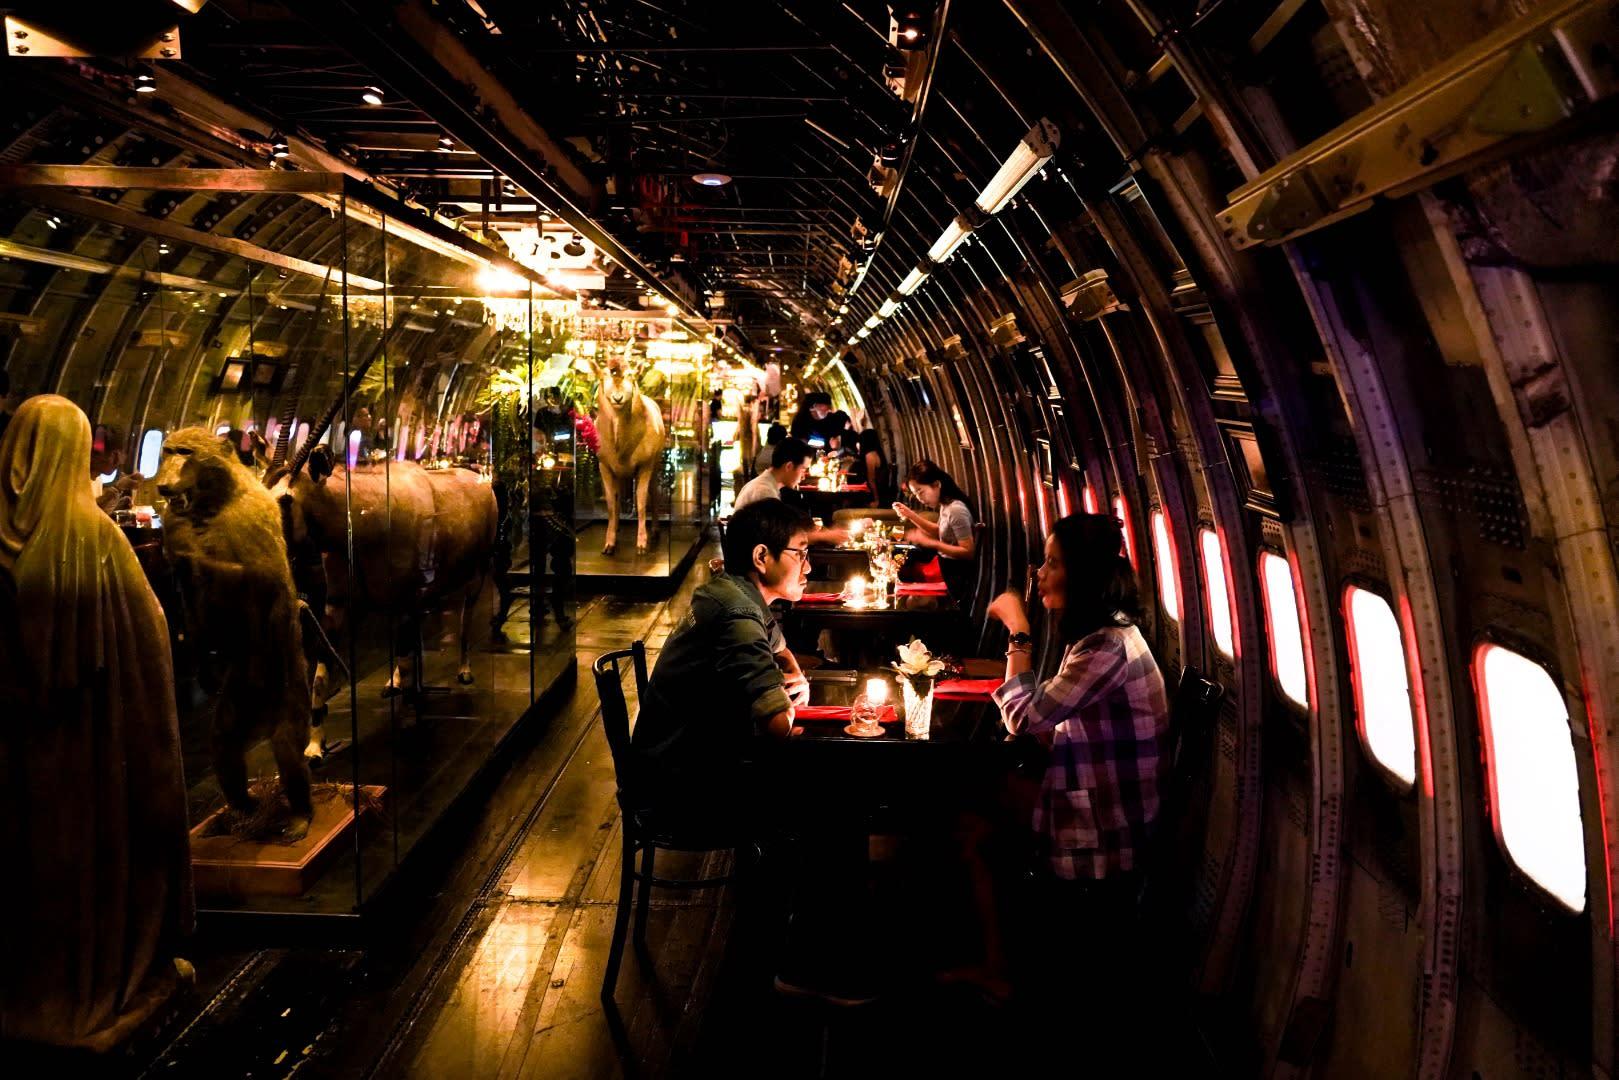 10 Bangkok Nightlife Activities For A Unique After-Dark